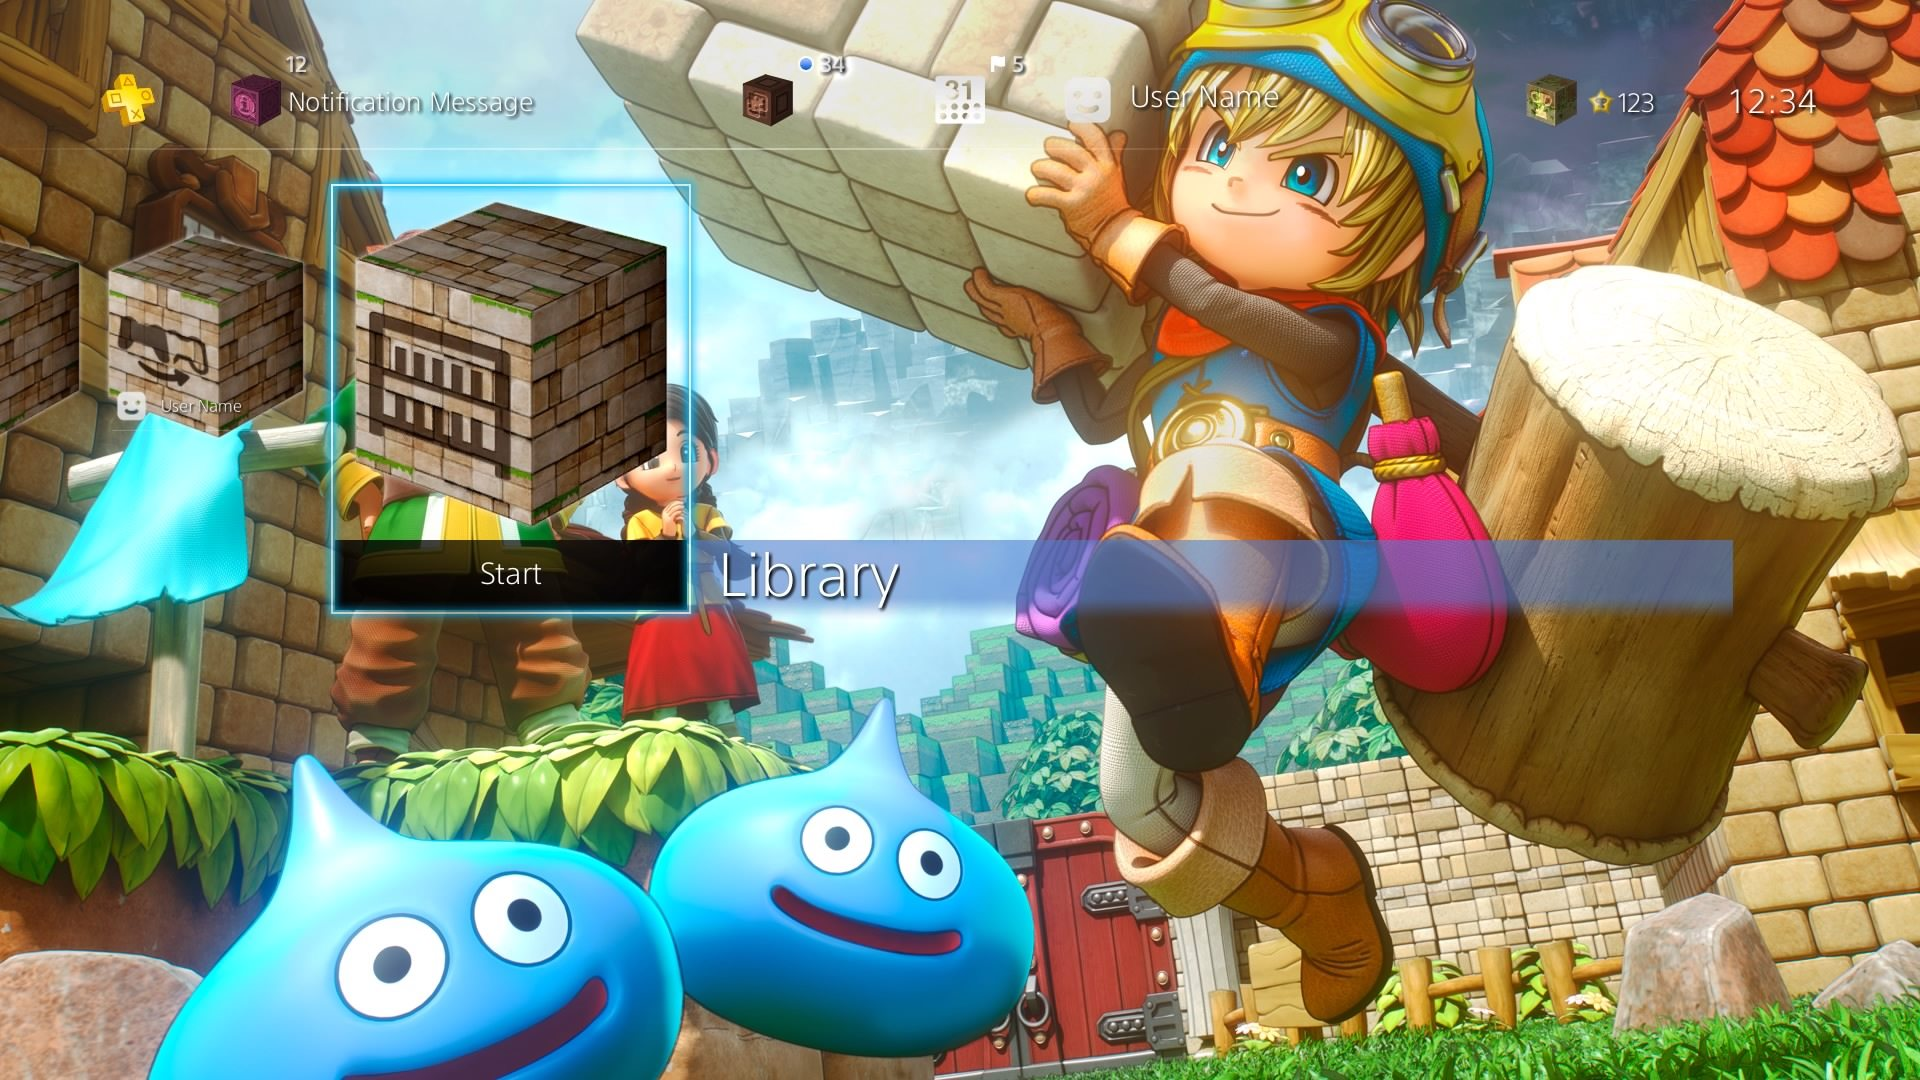 Dragon Quest Builders Special Building Recipes Announced